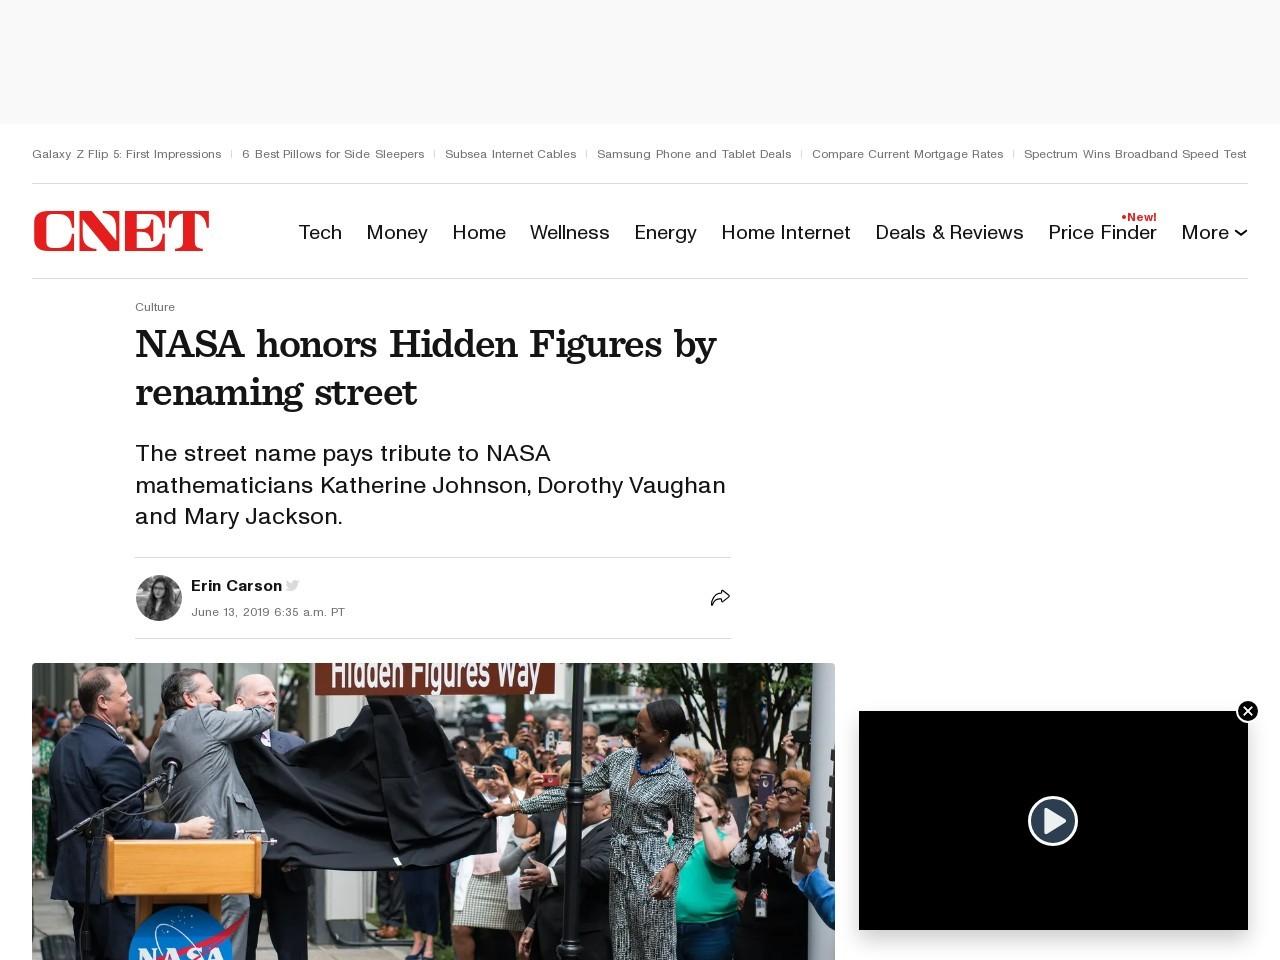 NASA honors 'Hidden Figures' by renaming street     – CNET